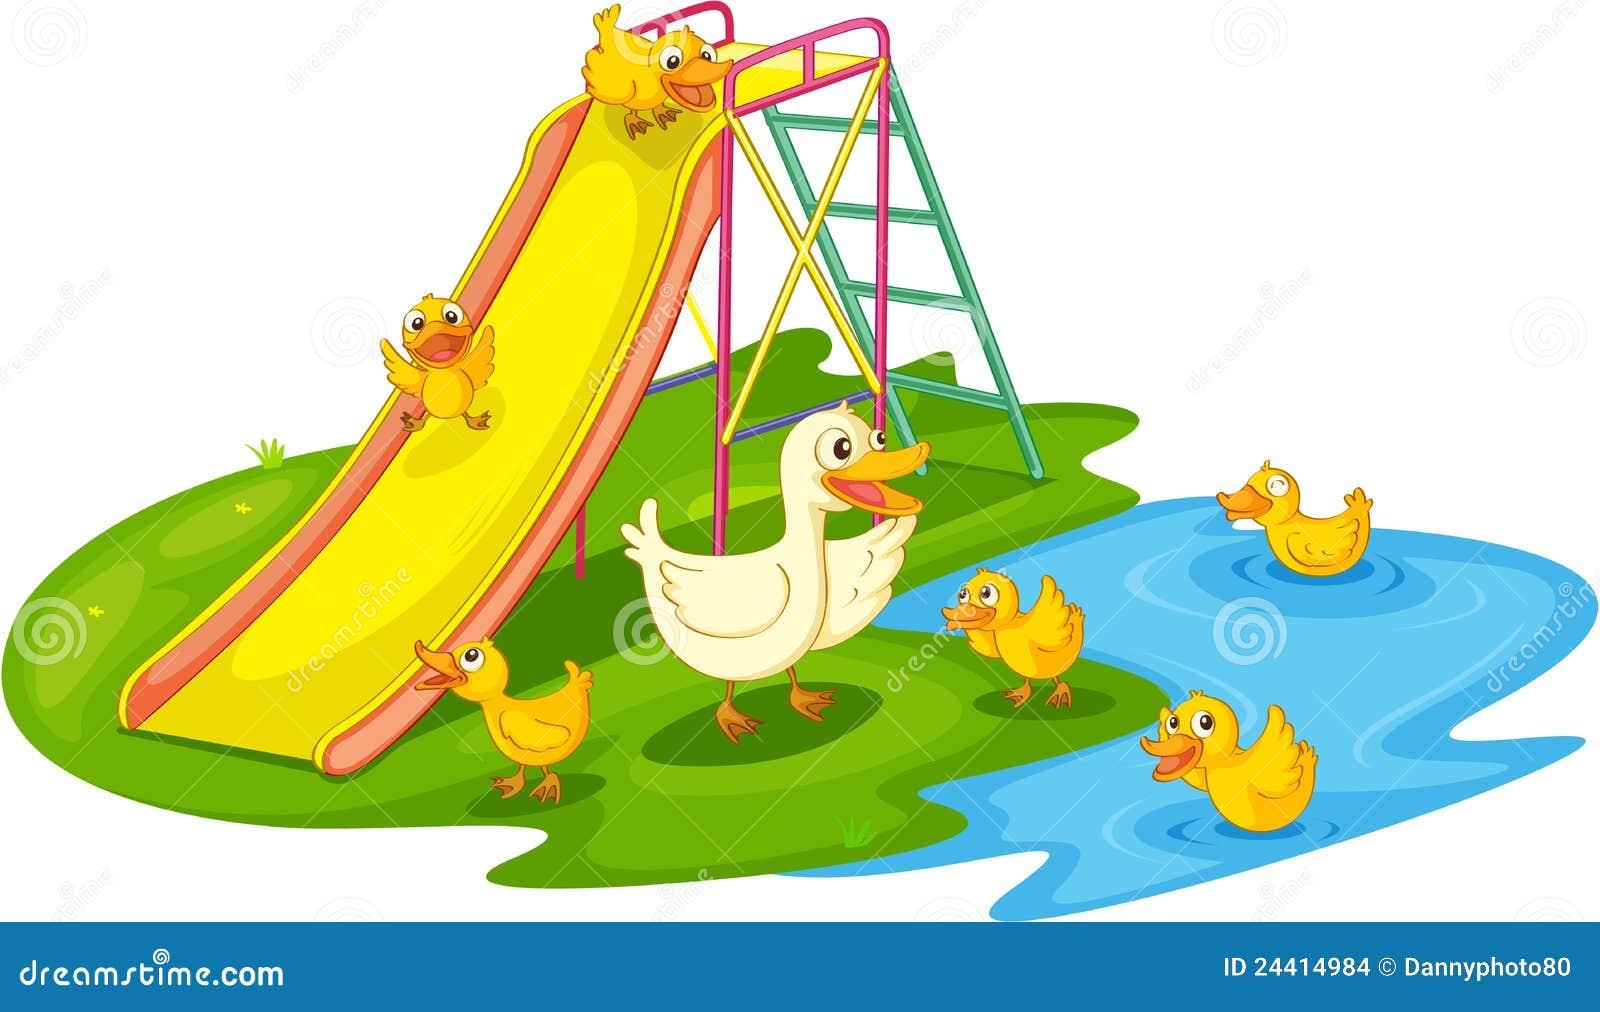 Ducks in a park stock vector image of freshwater grass for Duck slide plans